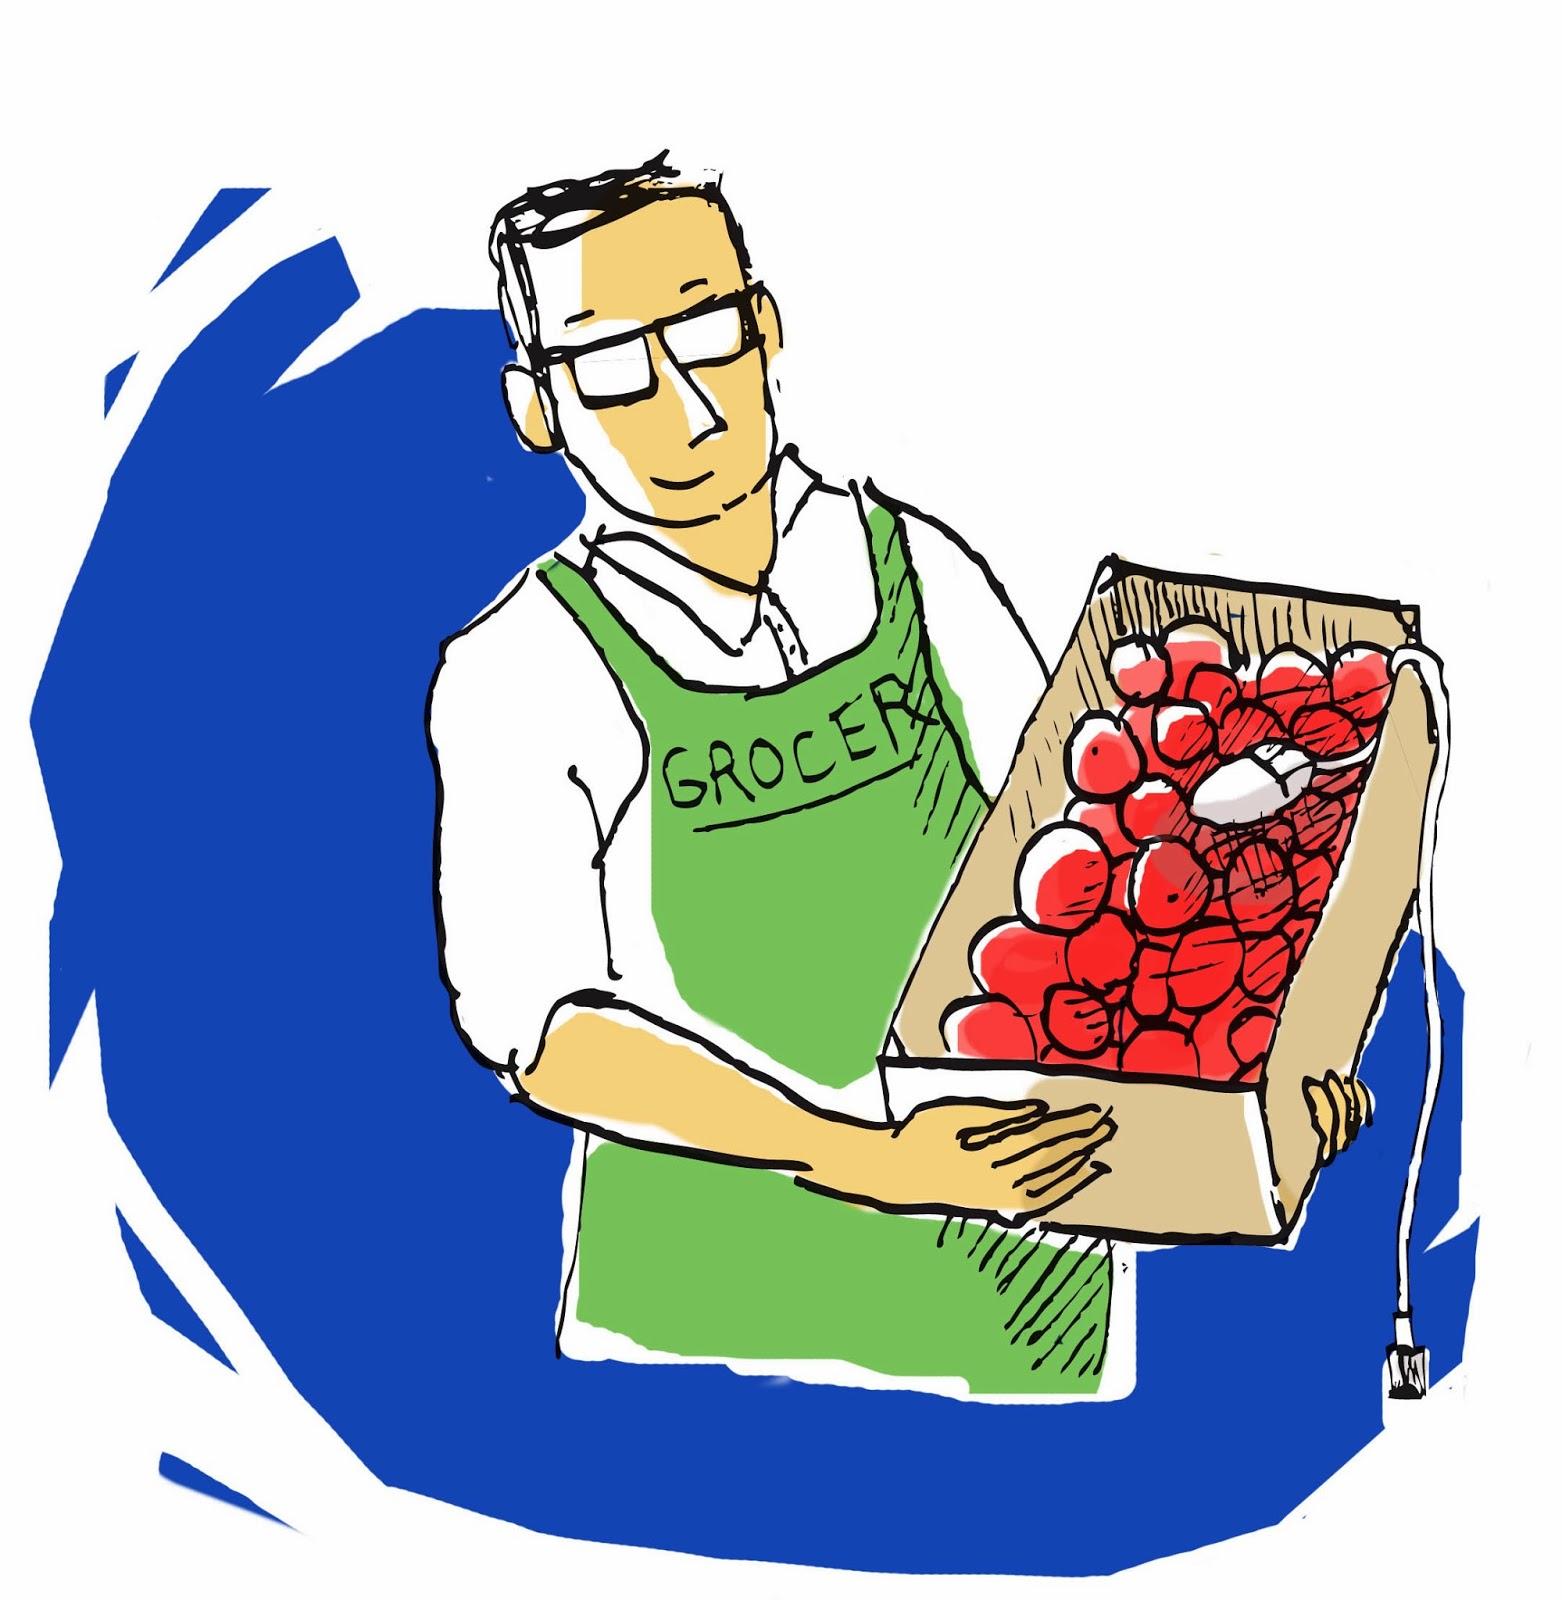 خضرى ، تاجر خضراوات ، بائع الخضراوات